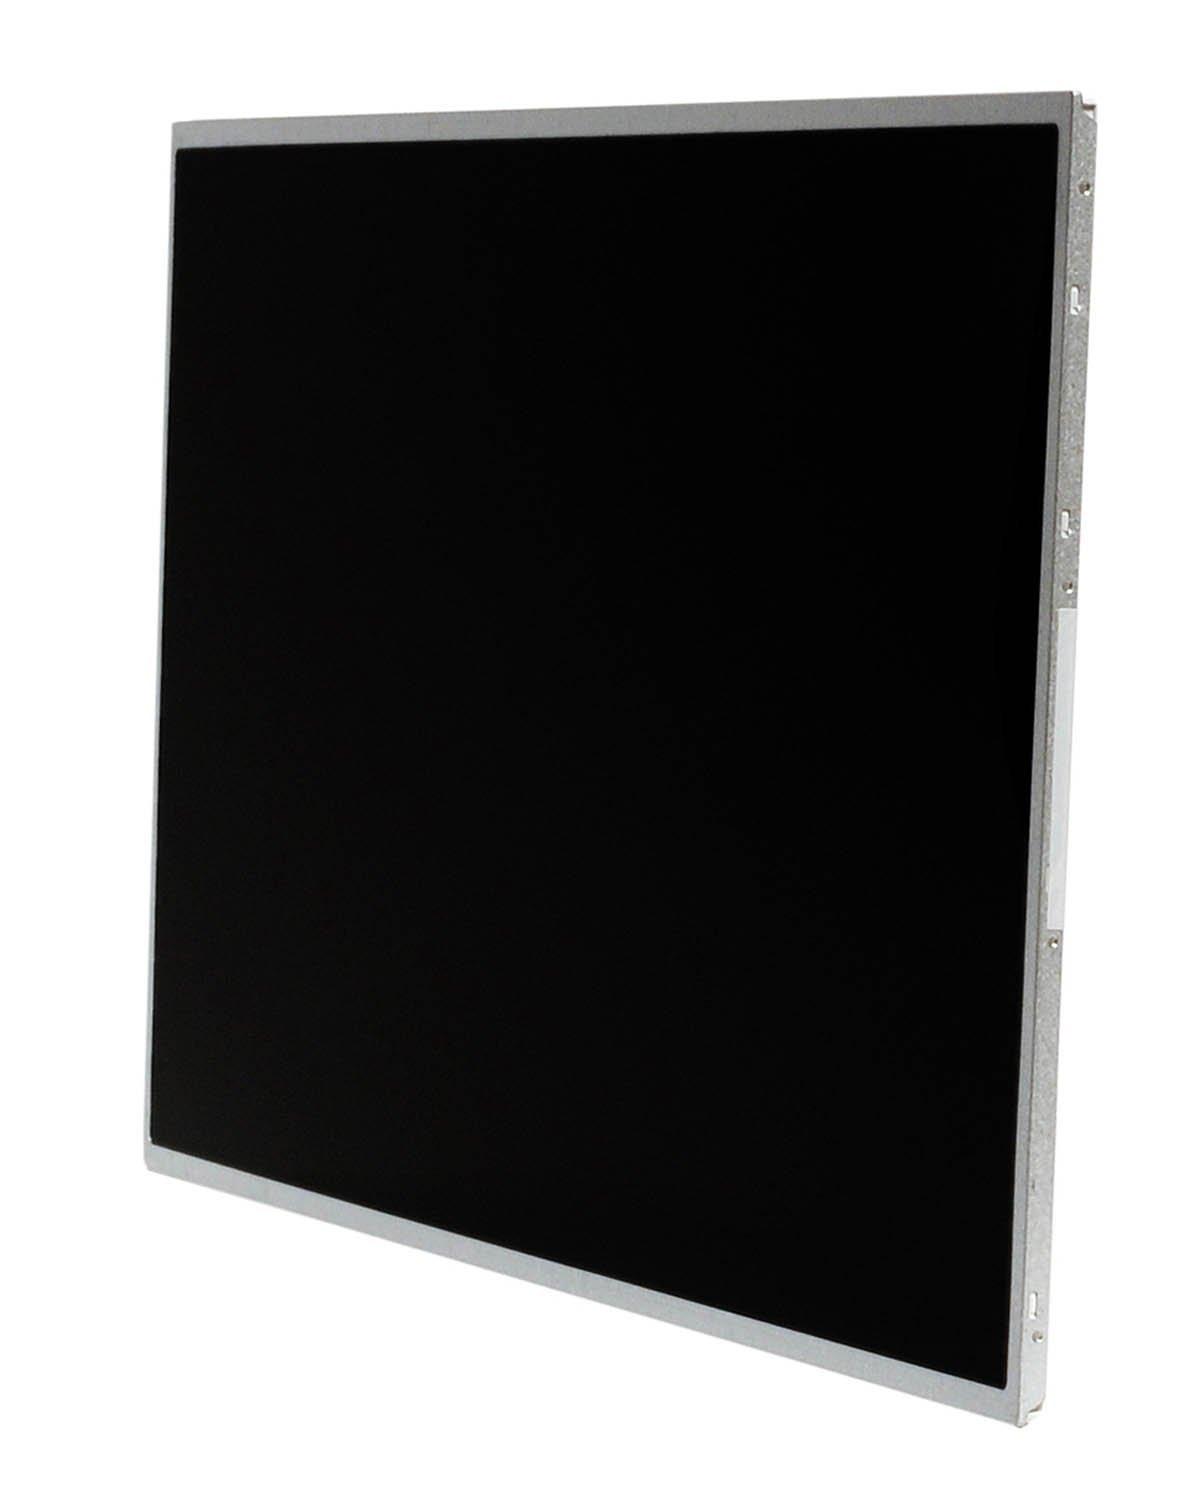 for Toshiba font b Satellite b font C55 B5297 New Display for 15 6 WXGA Laptop